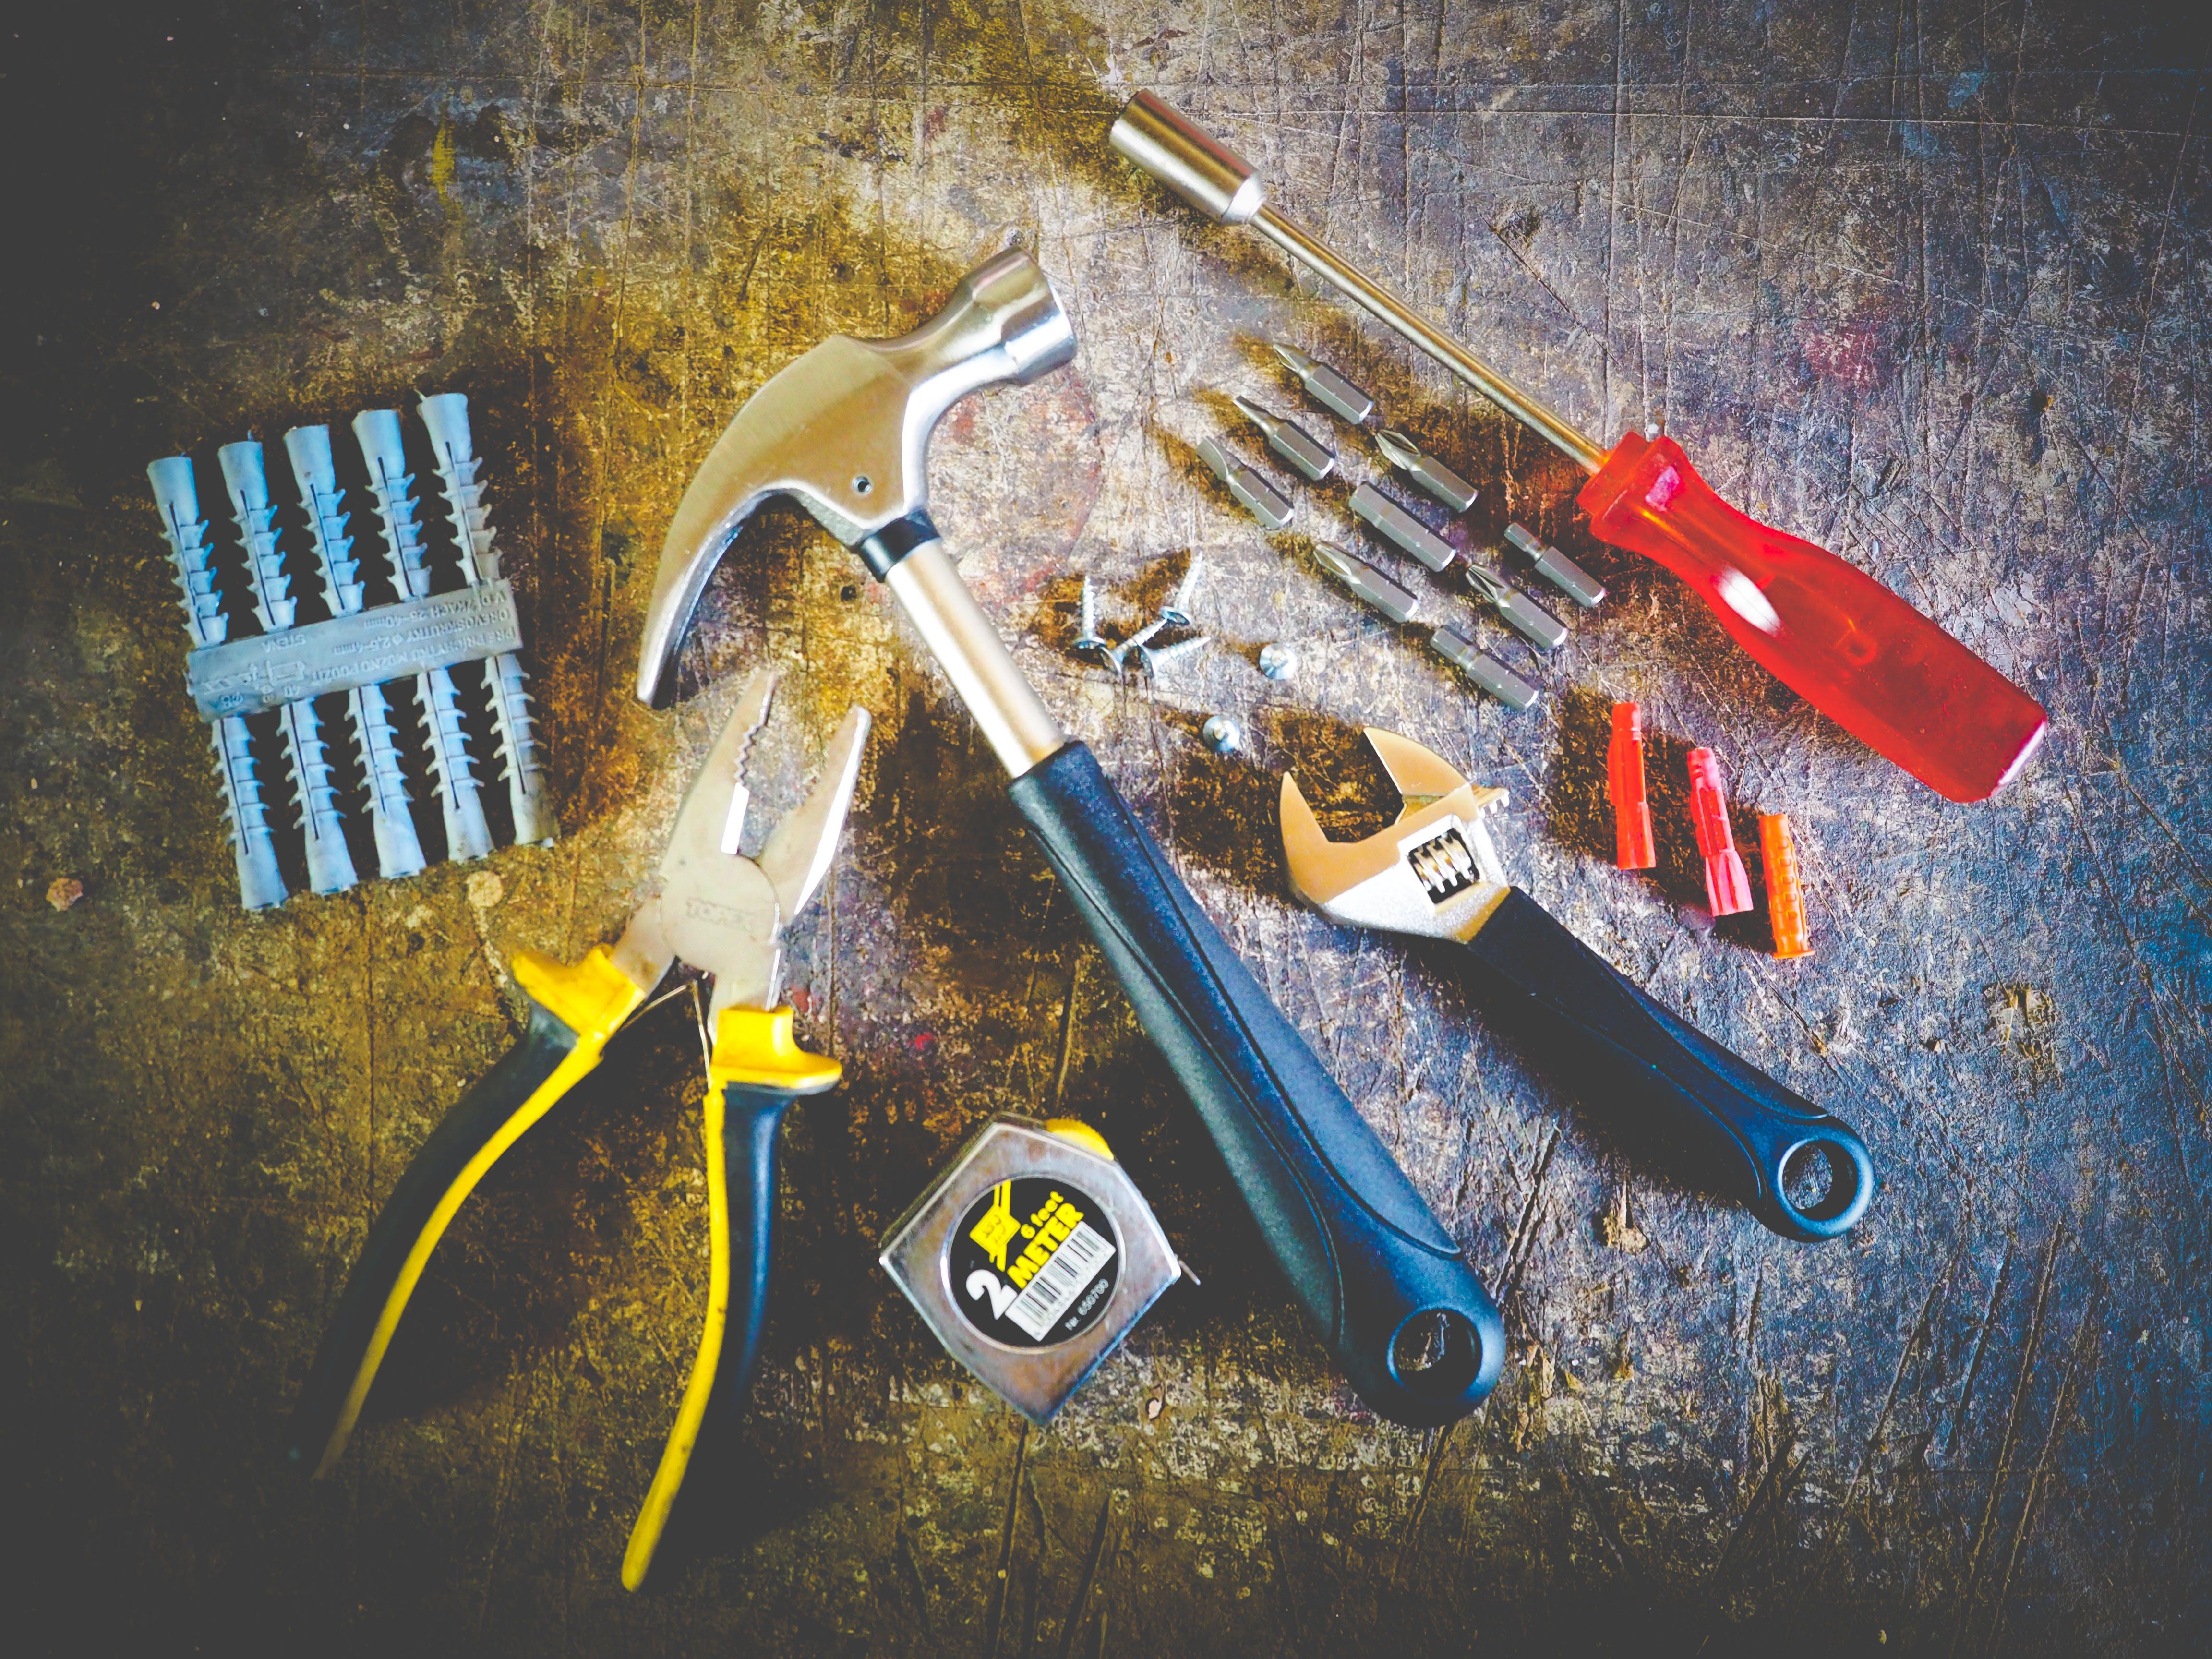 Gratis arkivbilde med hammer, hånd verktøy, seminar, skiftenøkkel